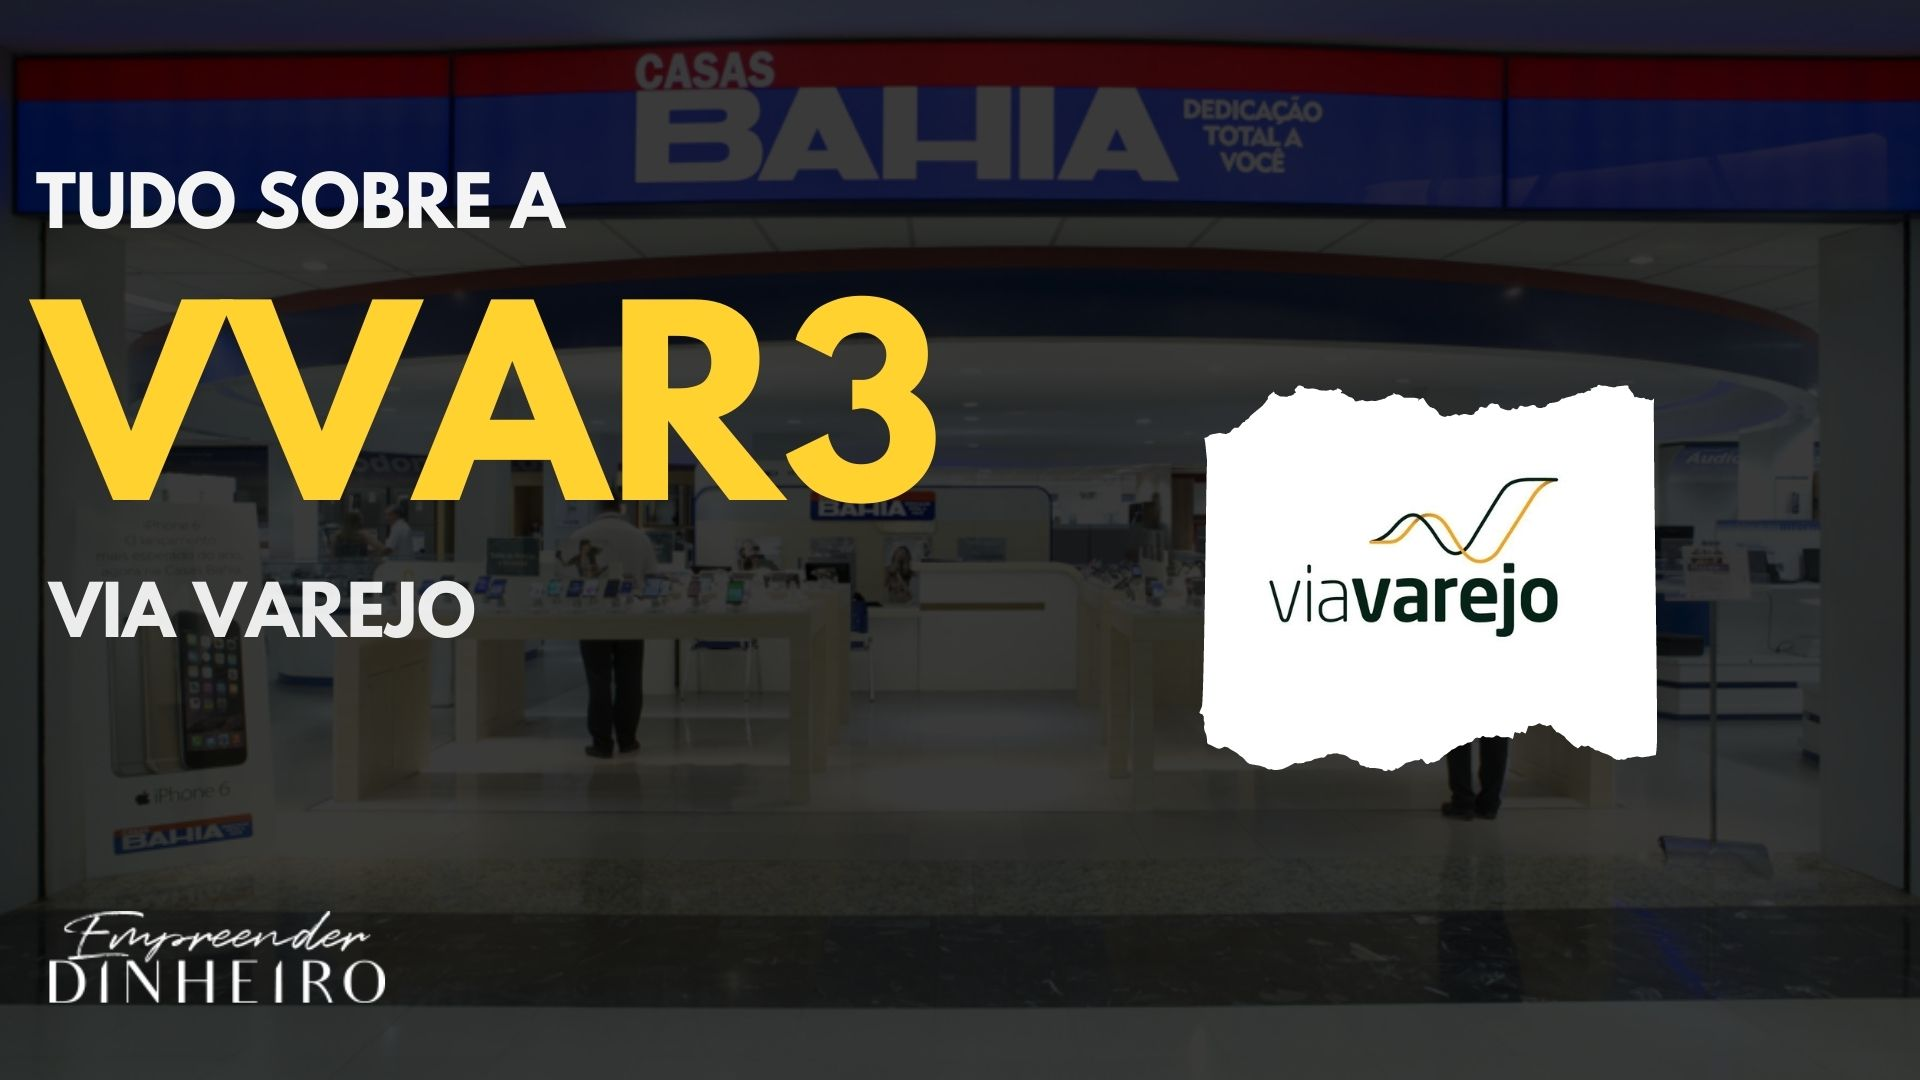 VVAR3